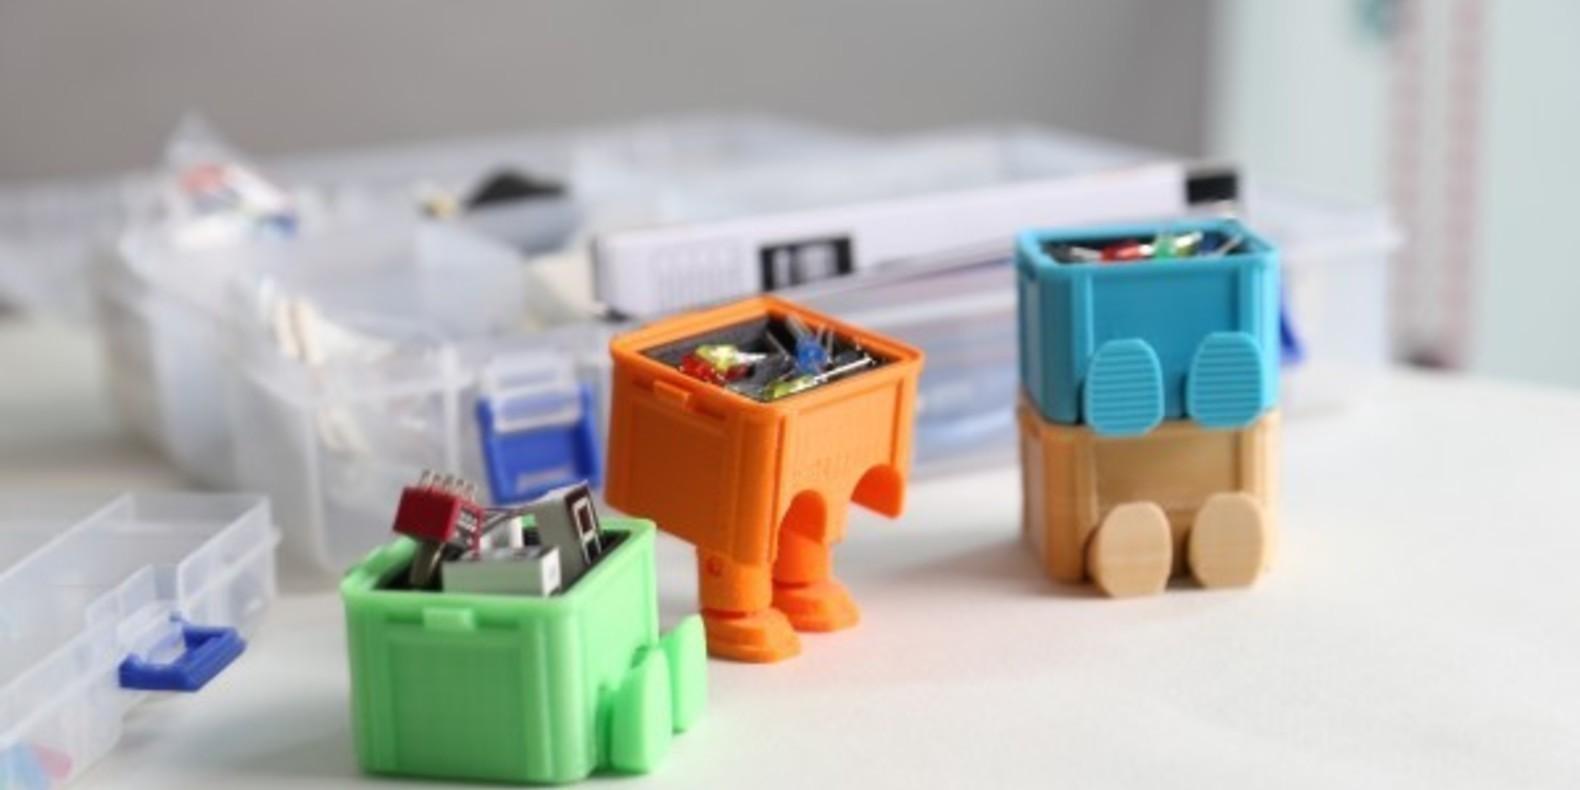 Step box step boite a outils tool box 3D printed 3D printing imprimée en 3D impression 3D Cults 1